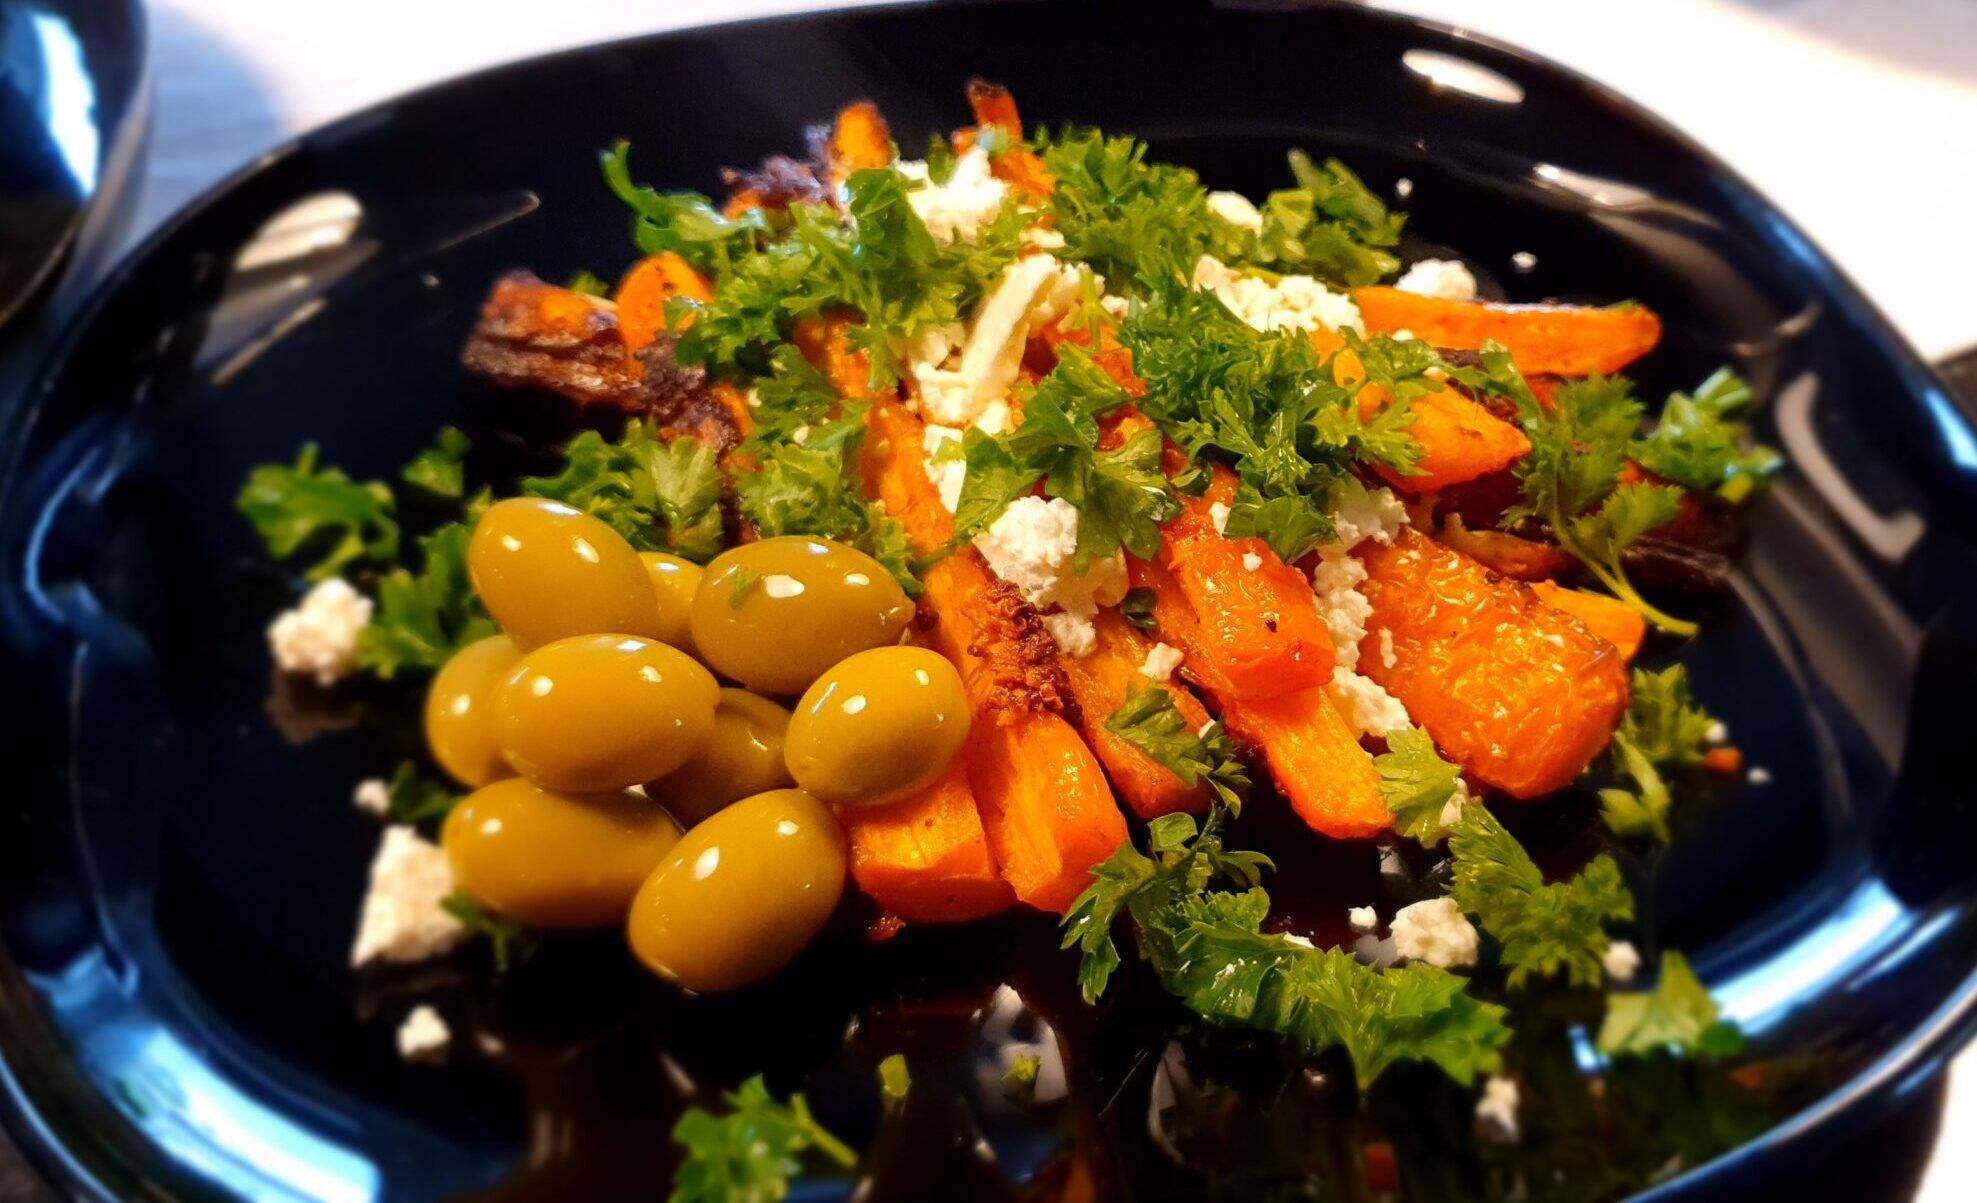 Ugnsbakade morötter med fetaost